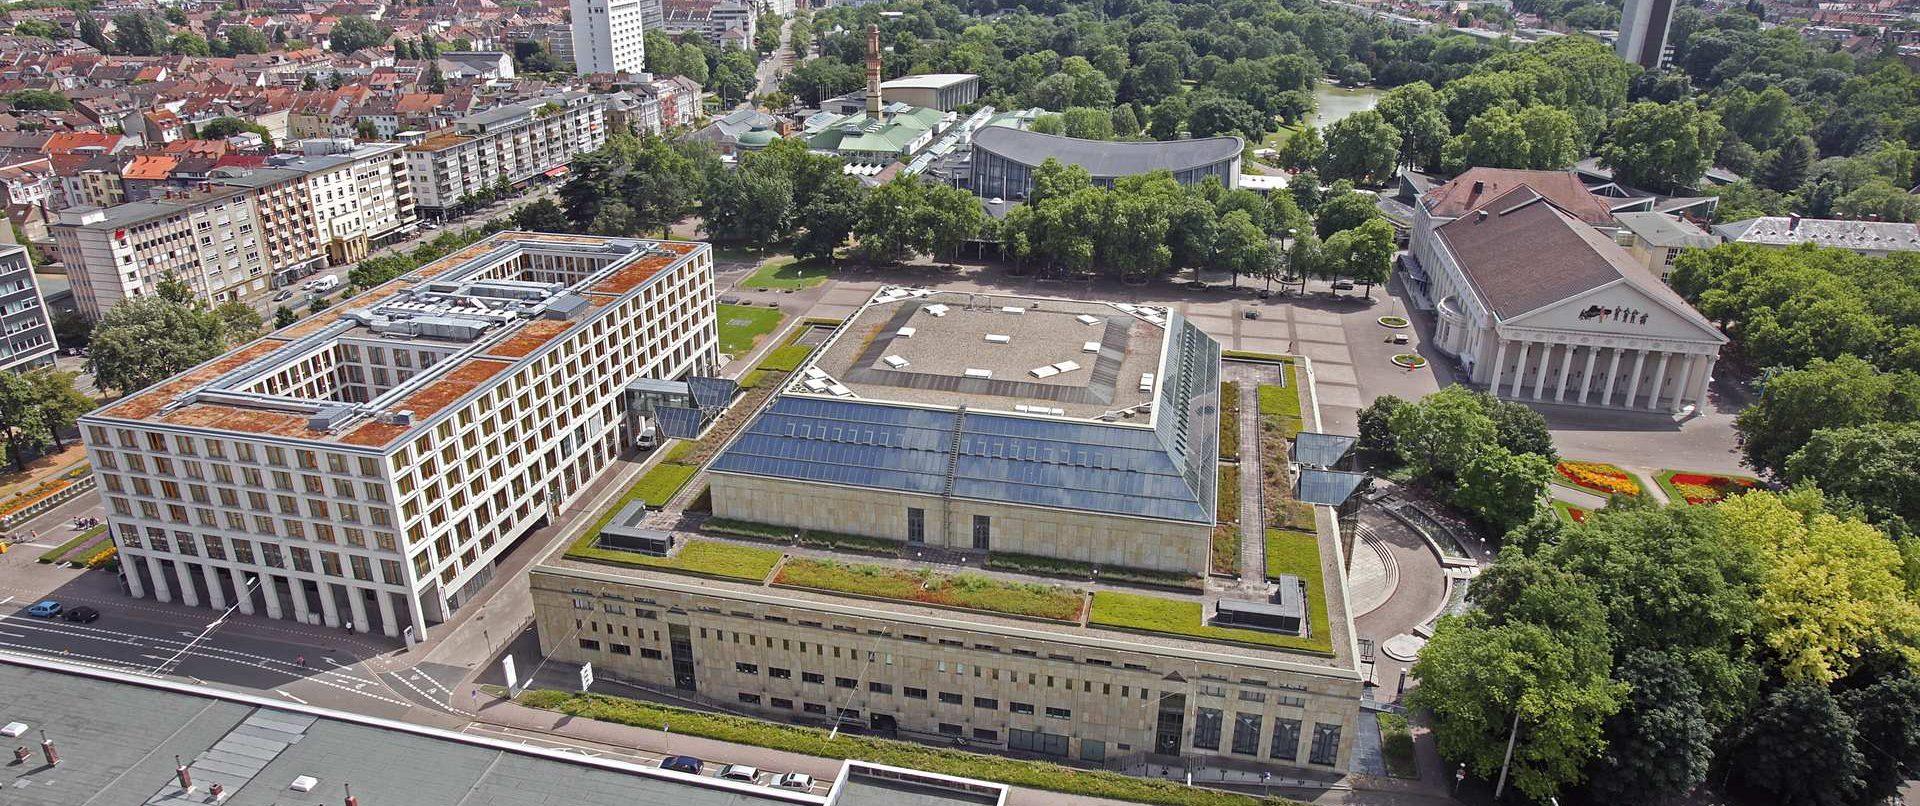 Messeplatz Karlsruhe